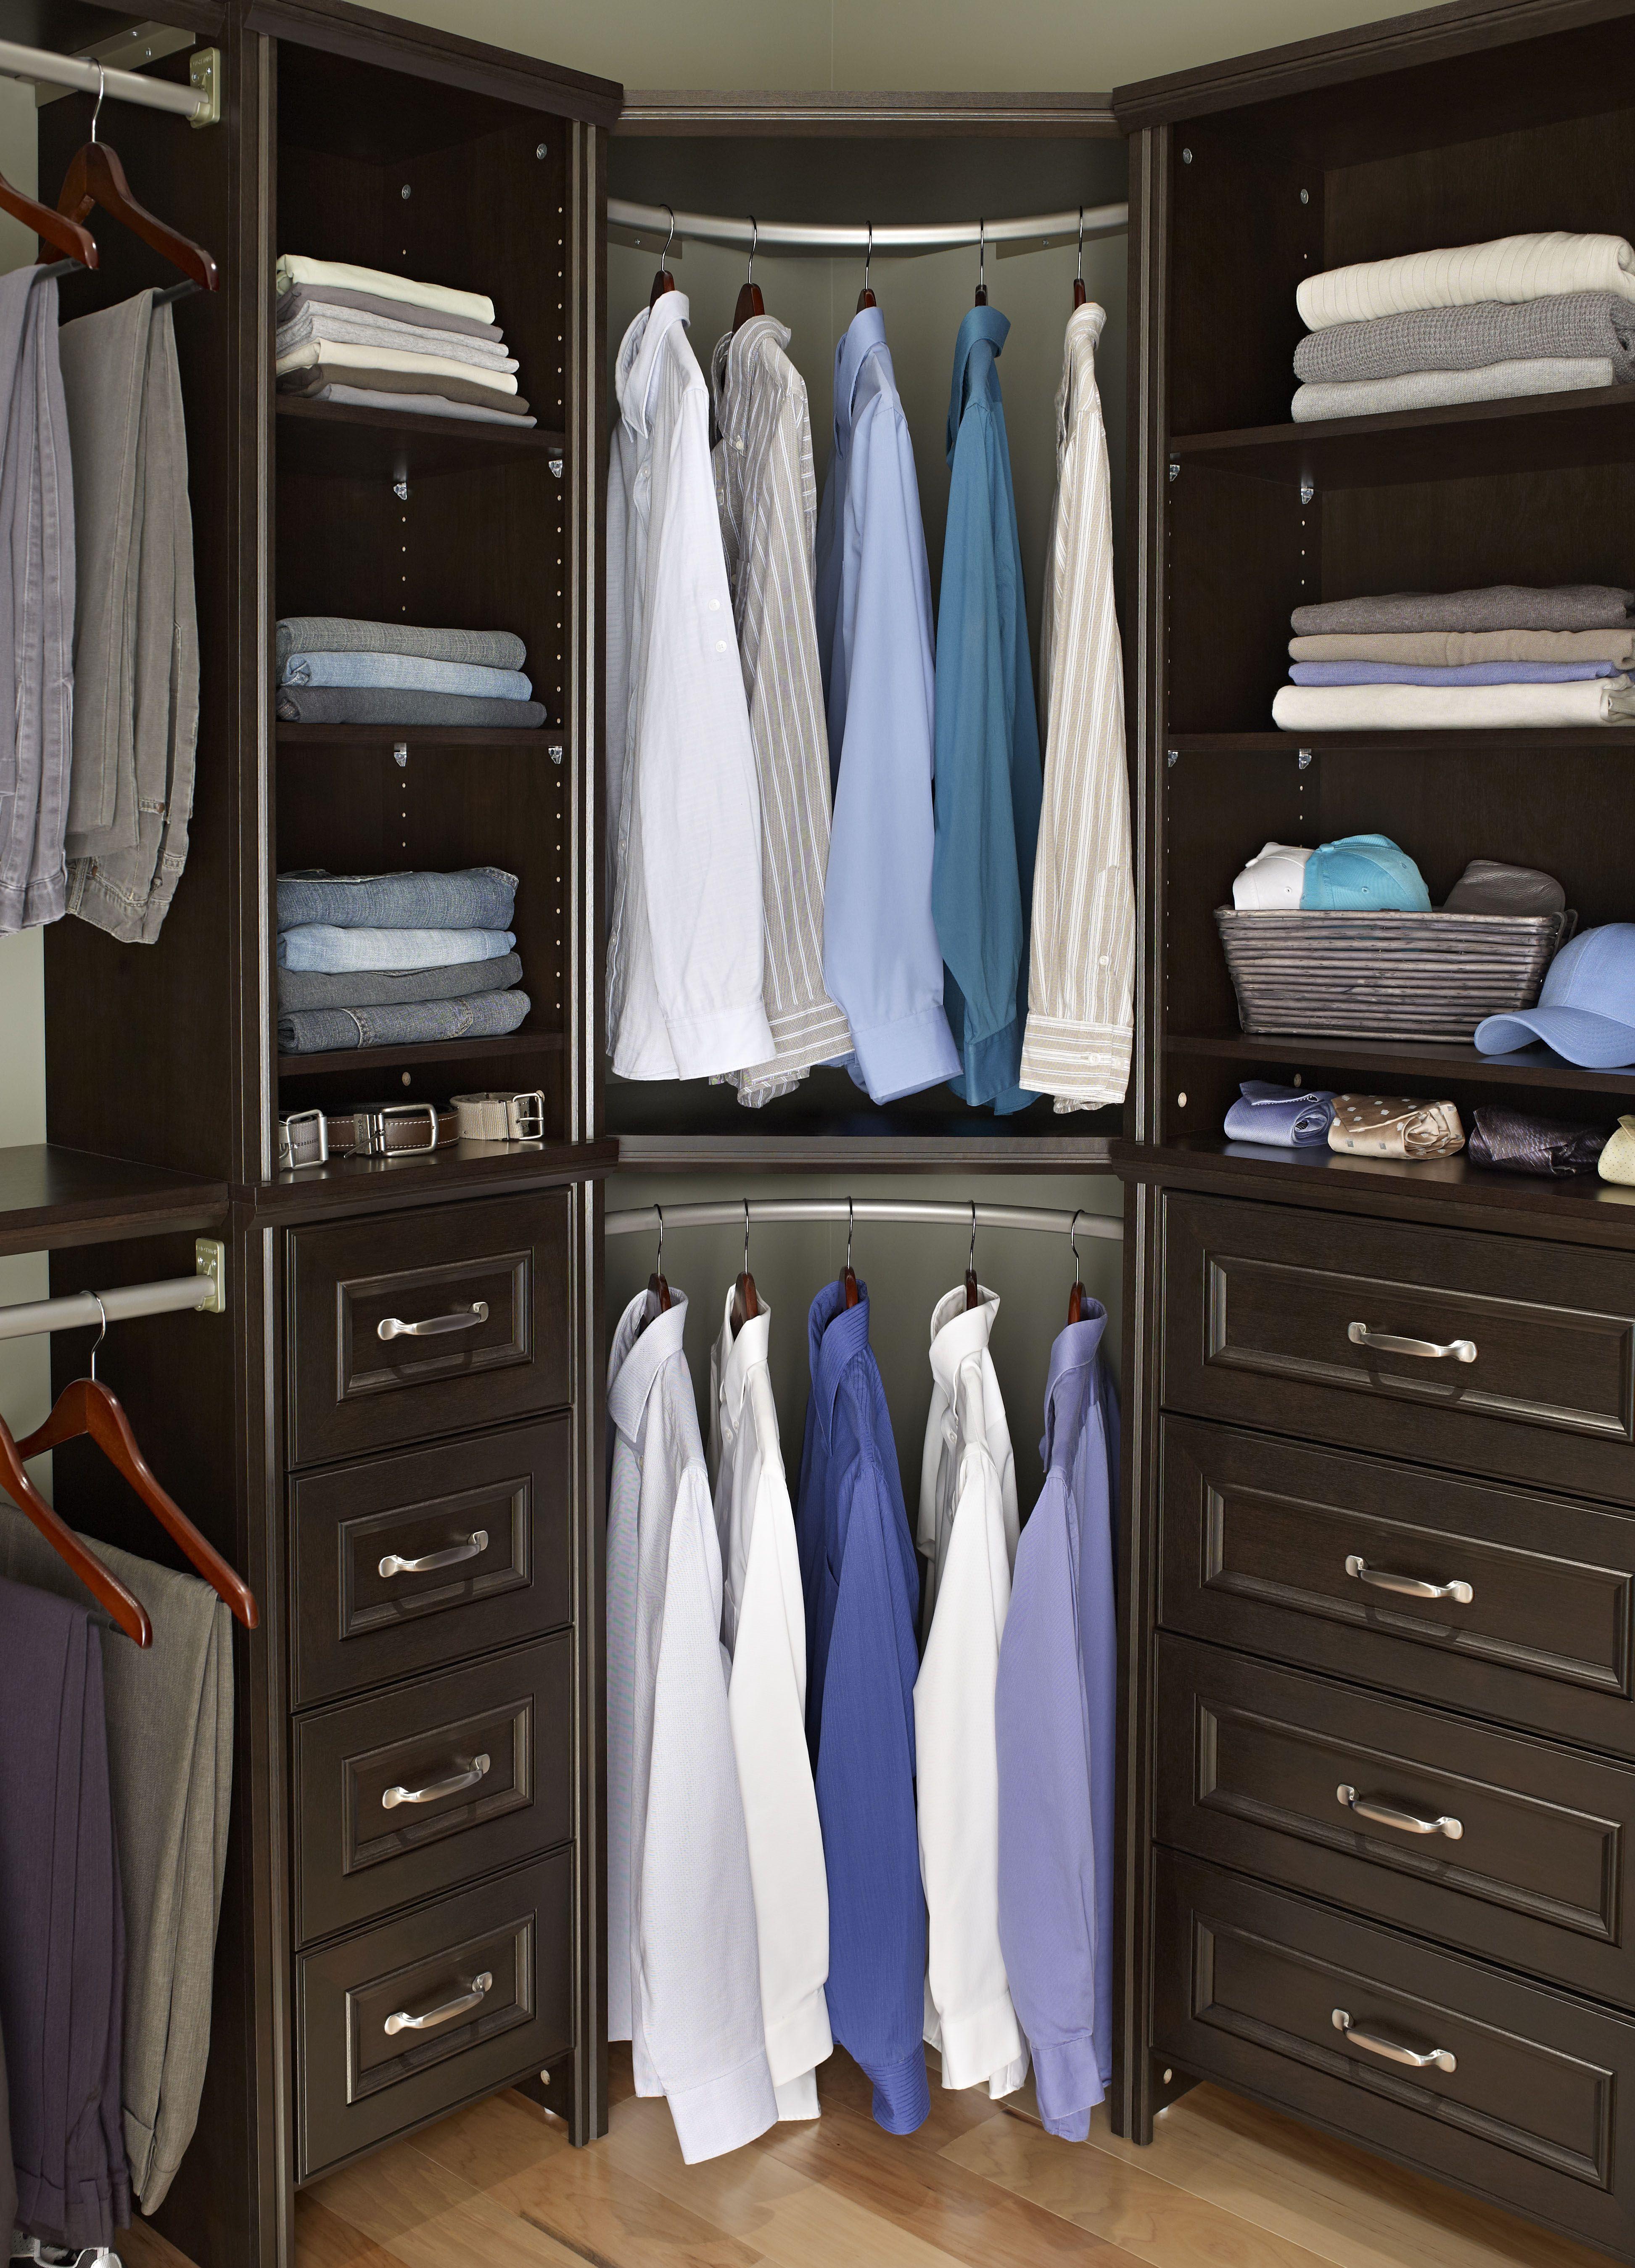 17 Best images about Master closet on Pinterest | Cherries, Dark and Corner  shelves